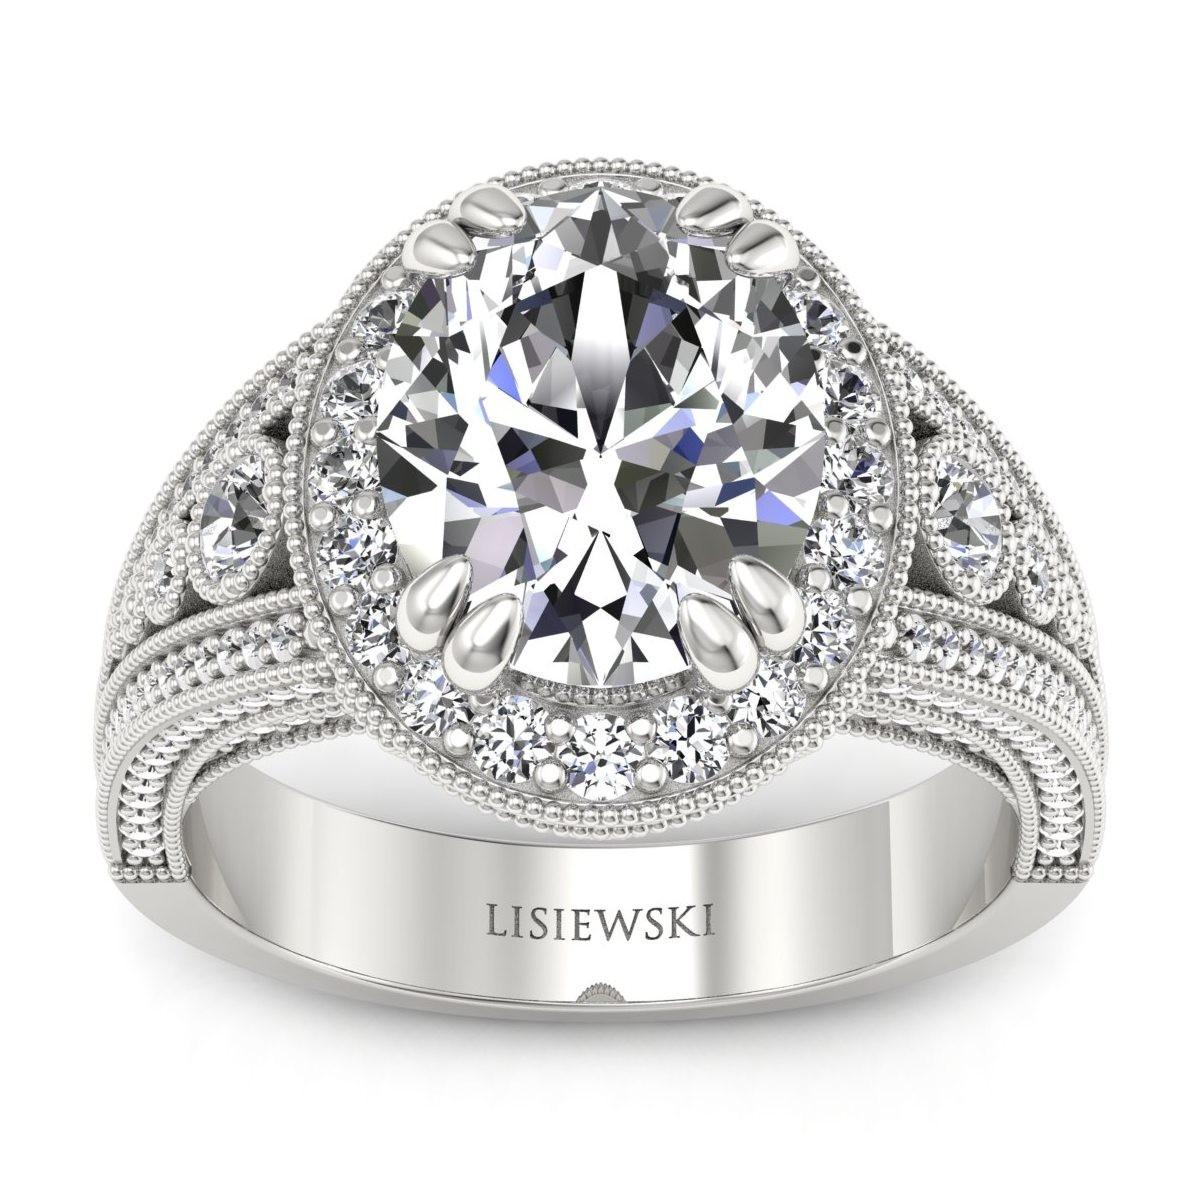 Biżuteria Lisiewski